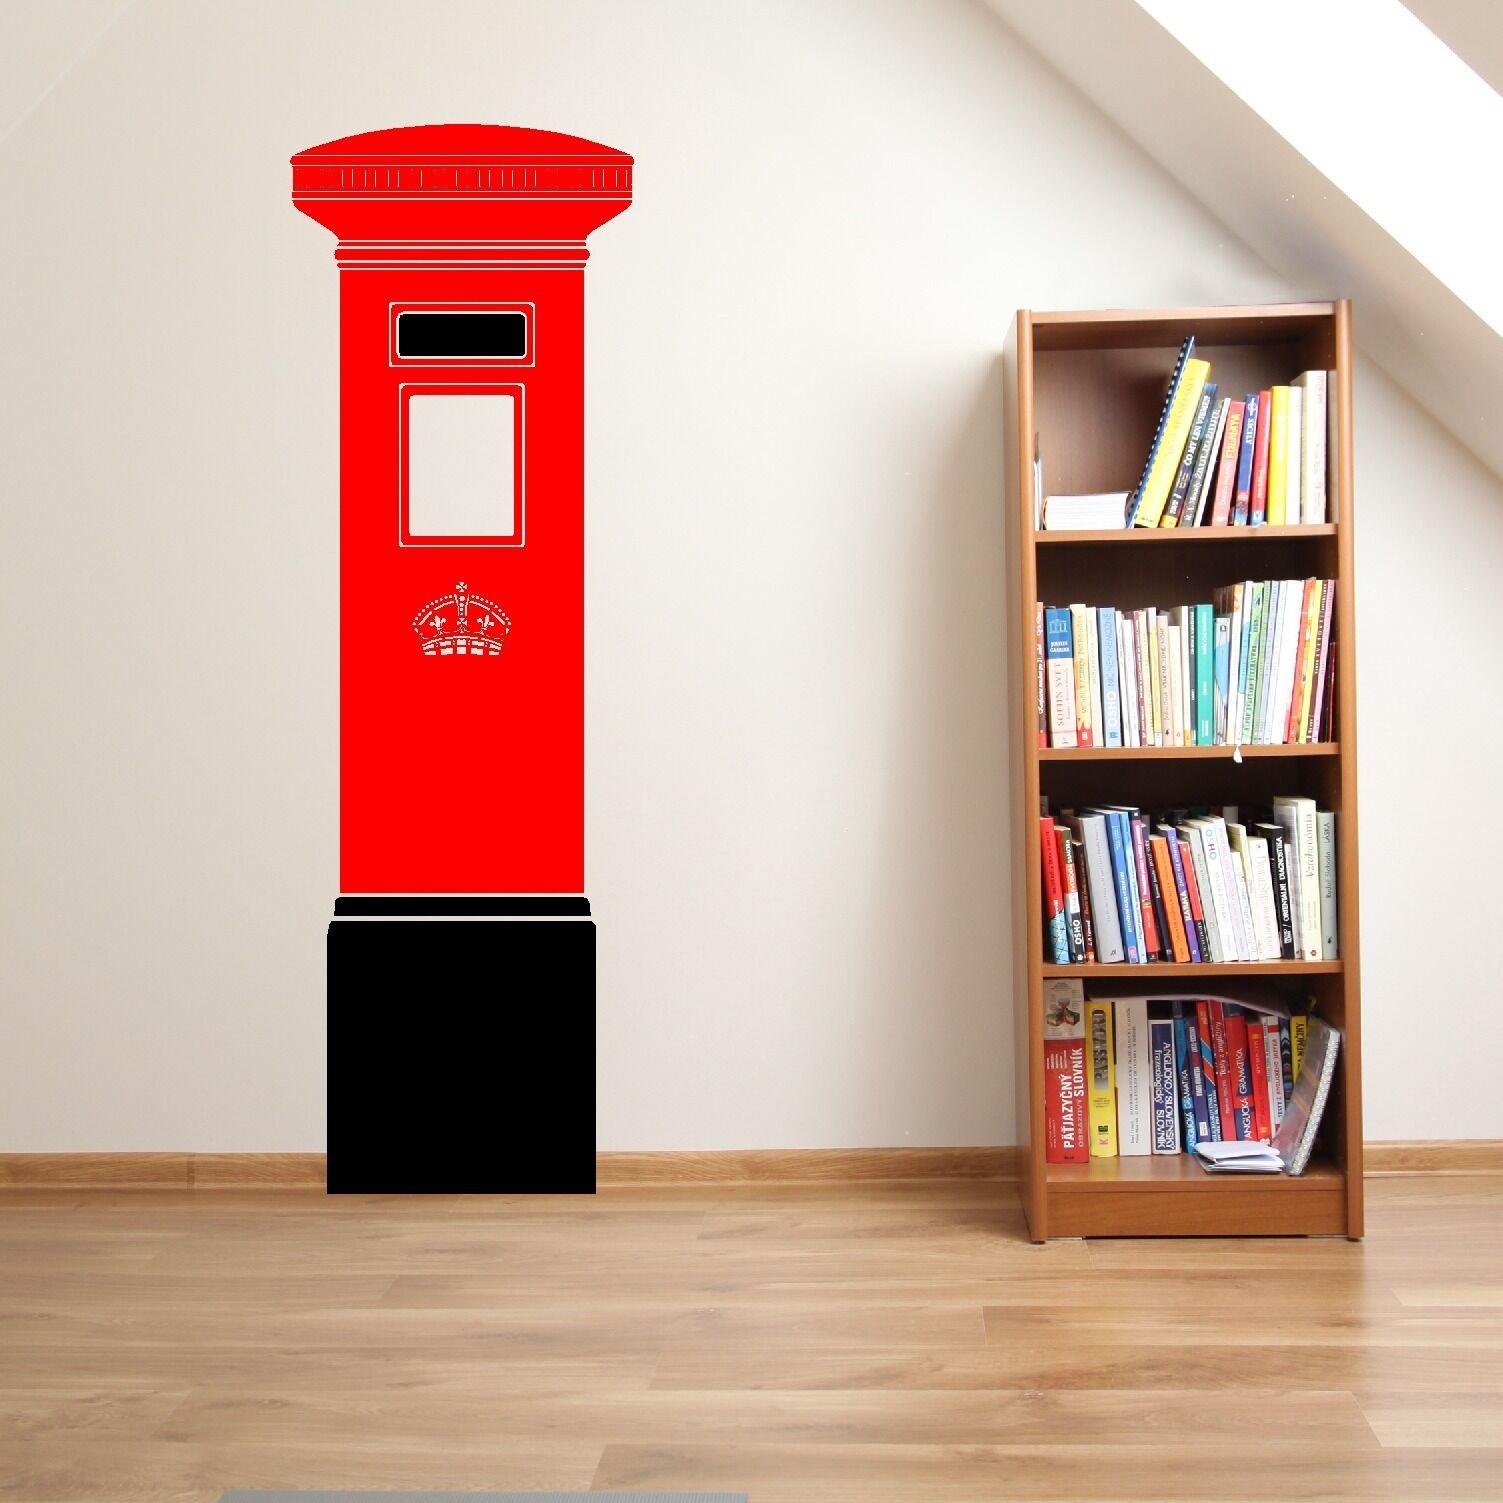 Letterbox Uk: UK POSTBOX LETTERBOX 48cm X 150cm VINYL WALL ART STICKER